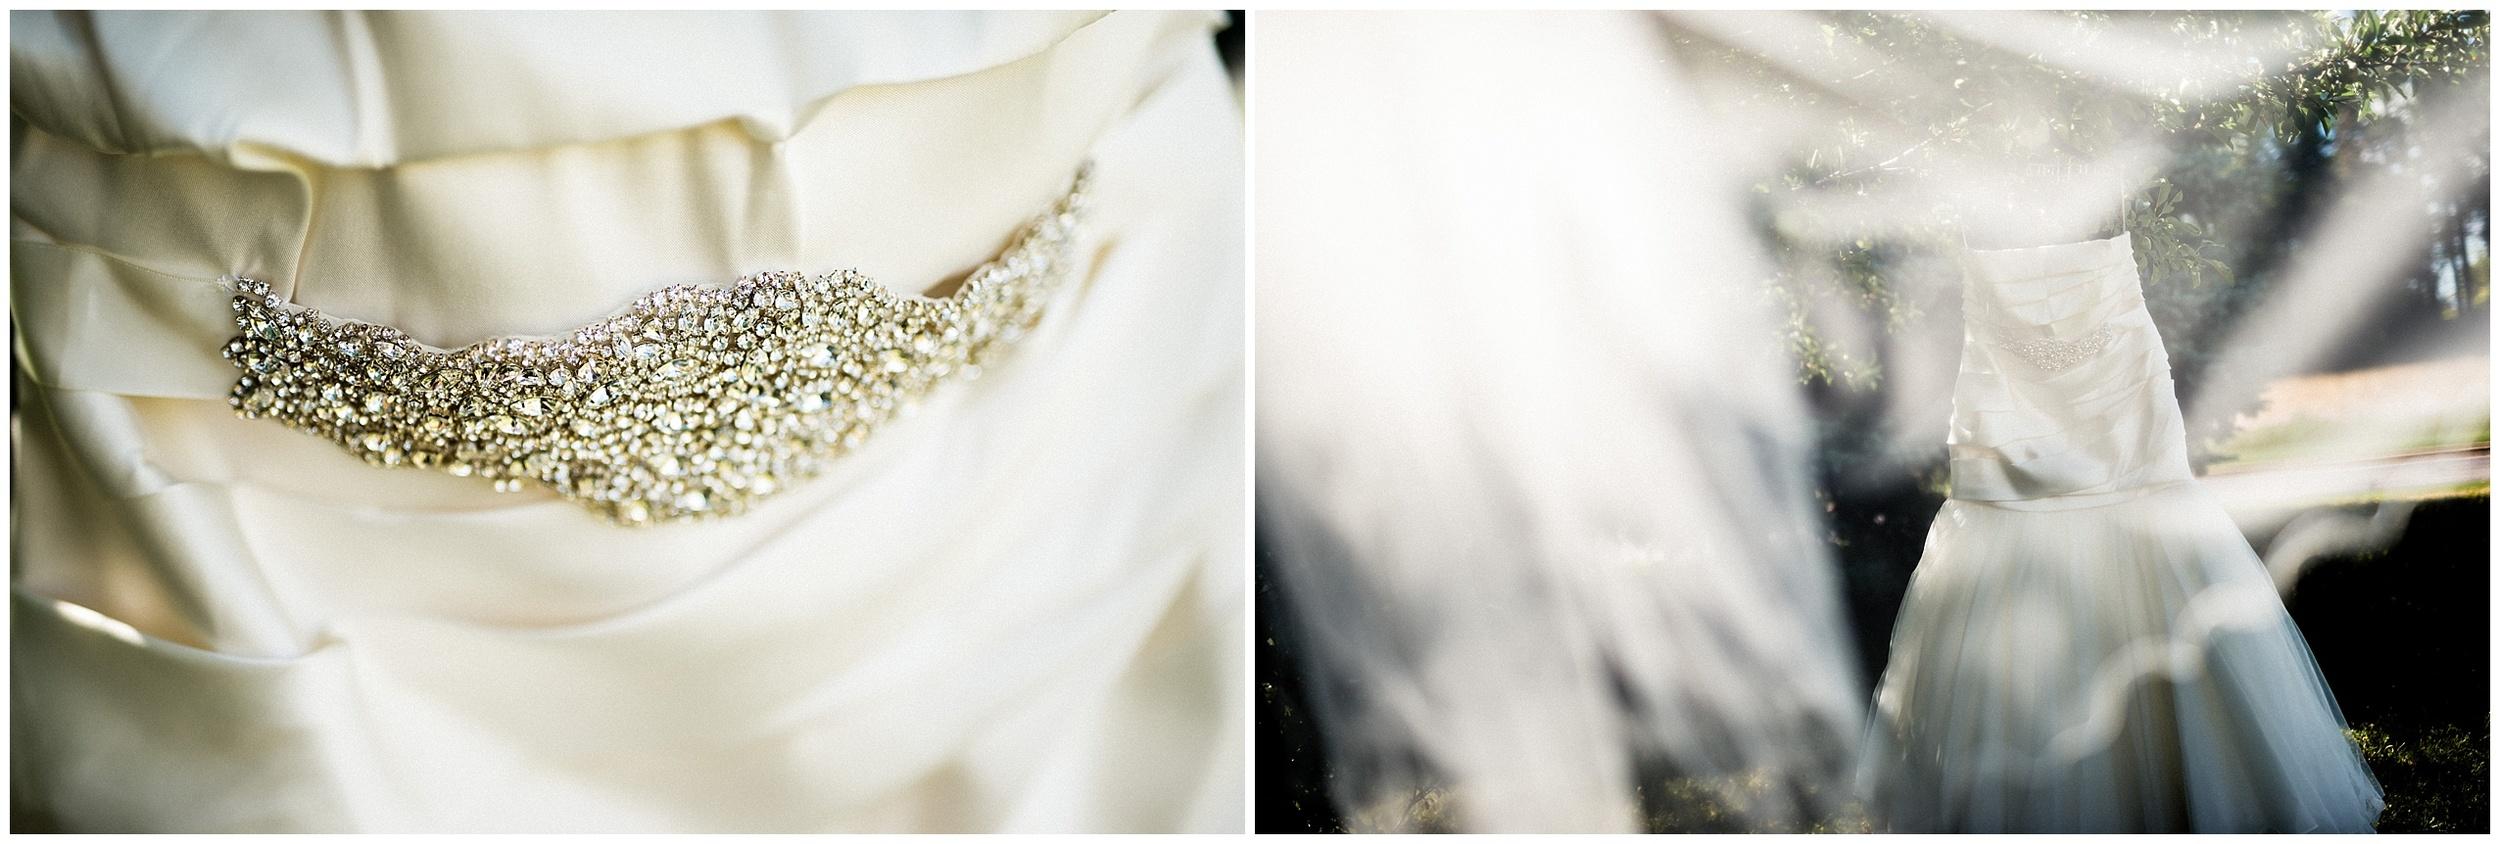 Josh + Ashley   Just Married #kyleepaigephotography_0416.jpg